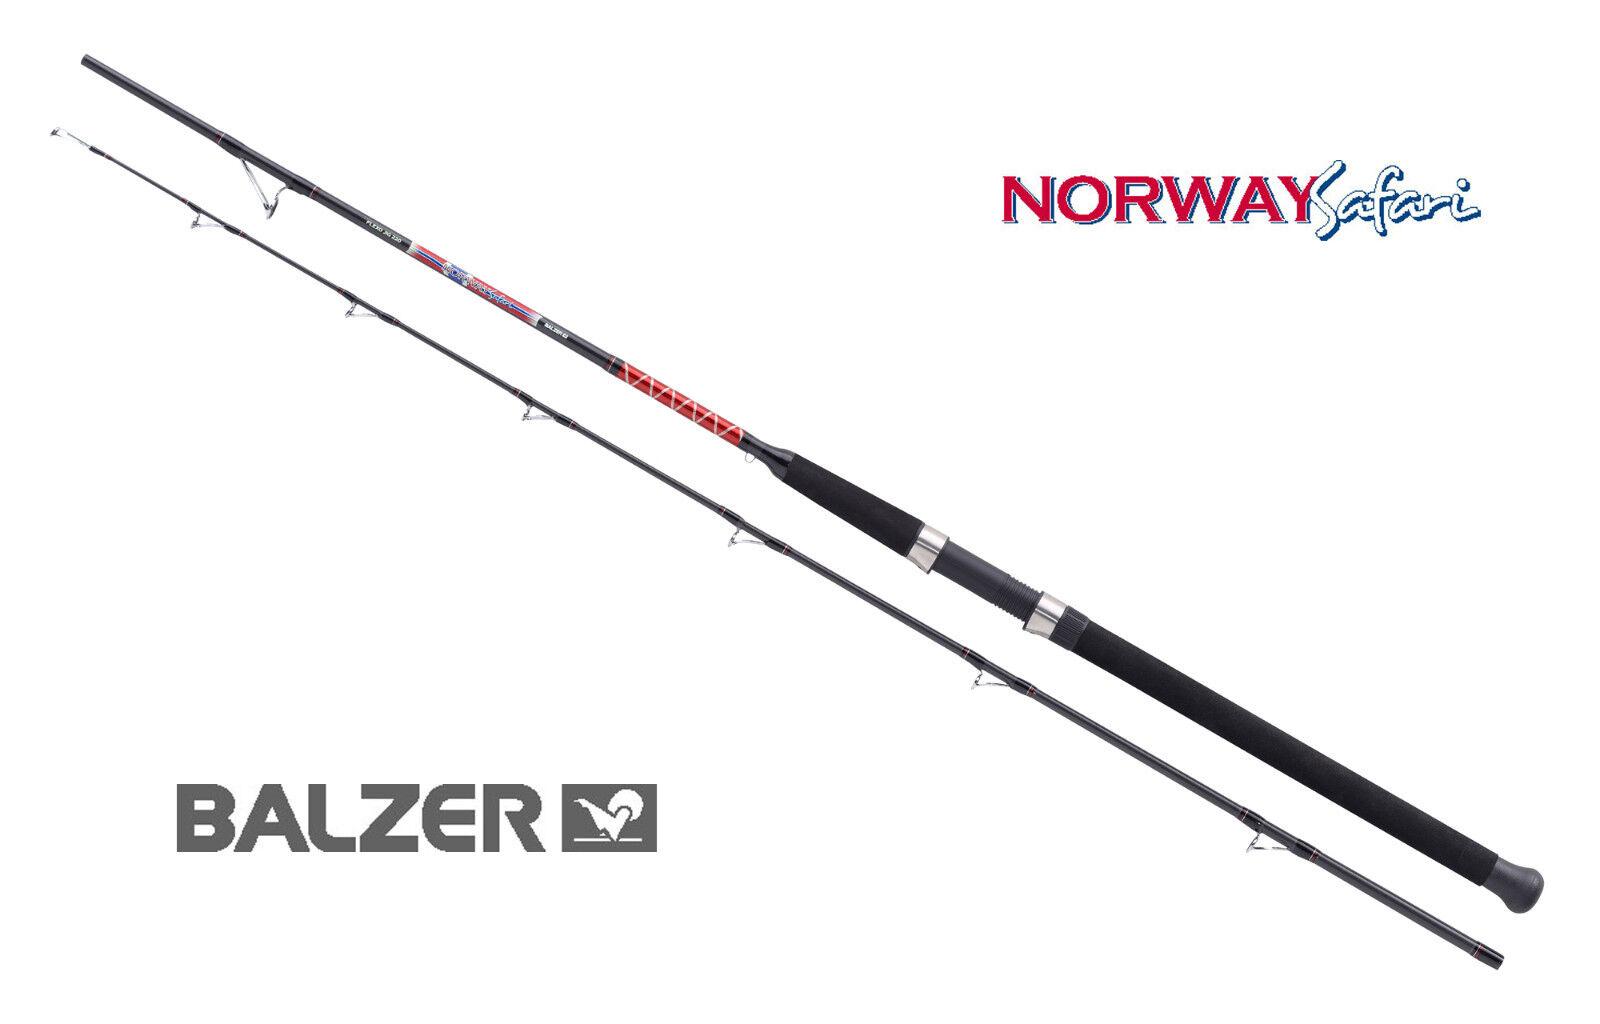 BALZER NORWAY Safari Flexo Jig 220- WG 55-220g  2,15 2,45 2,75m Pilkrute Jigrute